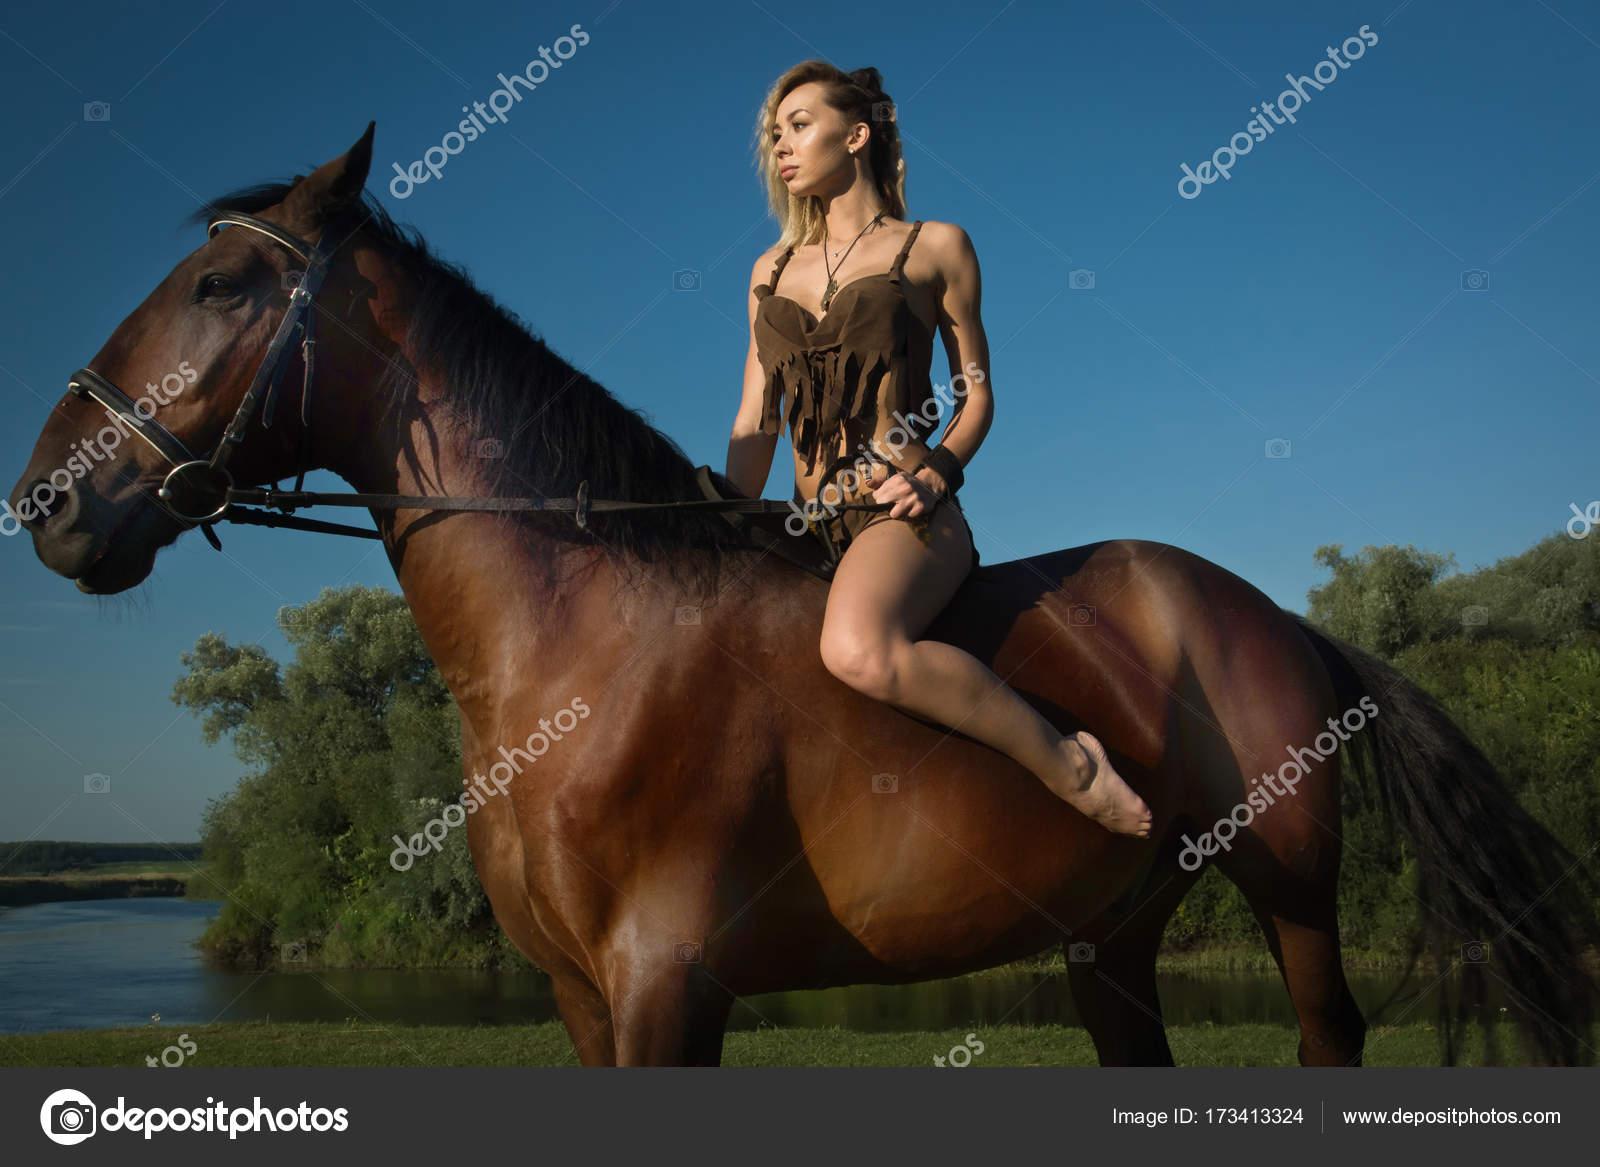 9ffbe1344 Chica salvaje Amazona a caballo — Foto de stock © Demian  173413324